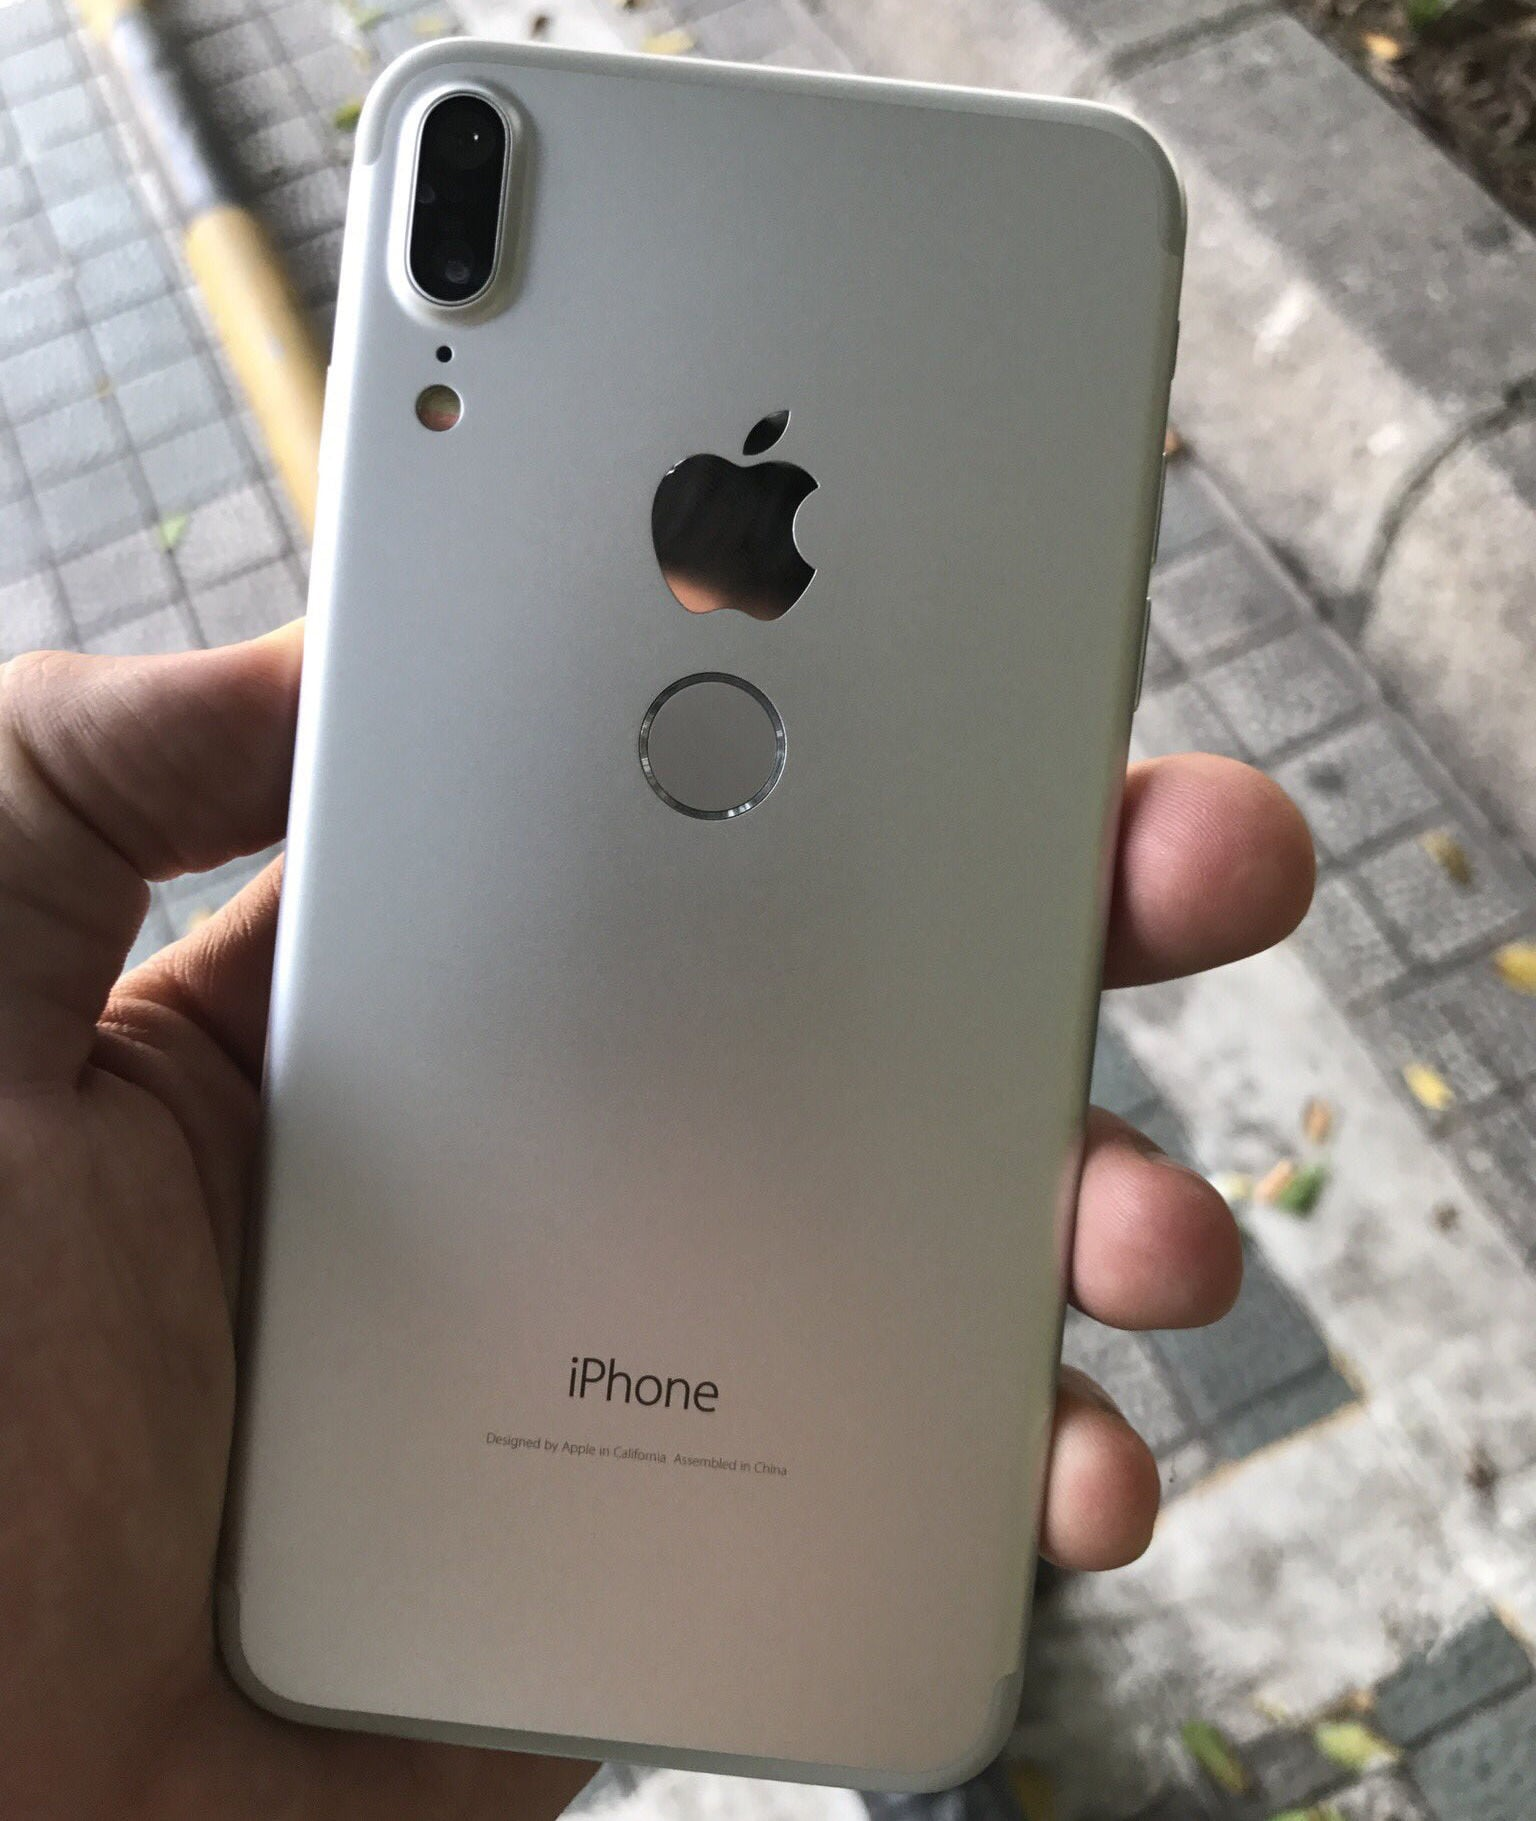 IPhone8 Fakemockup 03